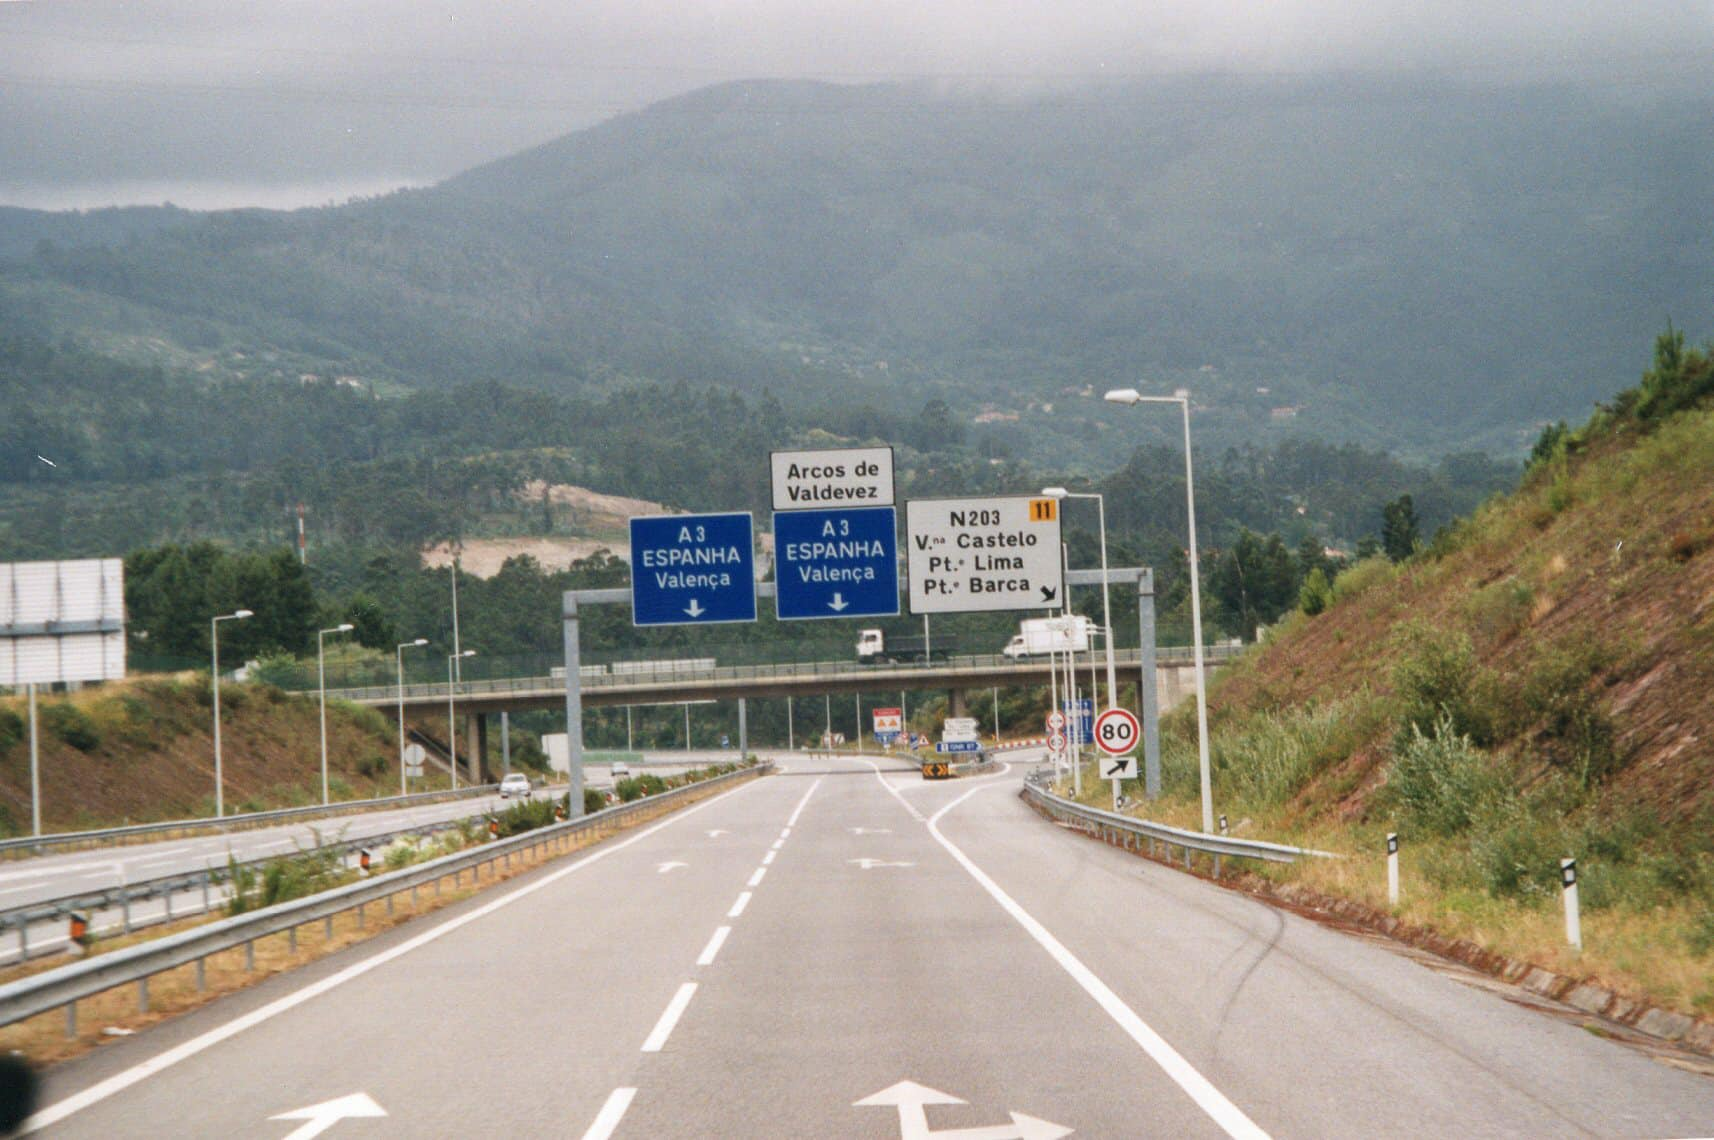 Onder-weg--van-porto-naar-Vigo-Hendrik-Westra